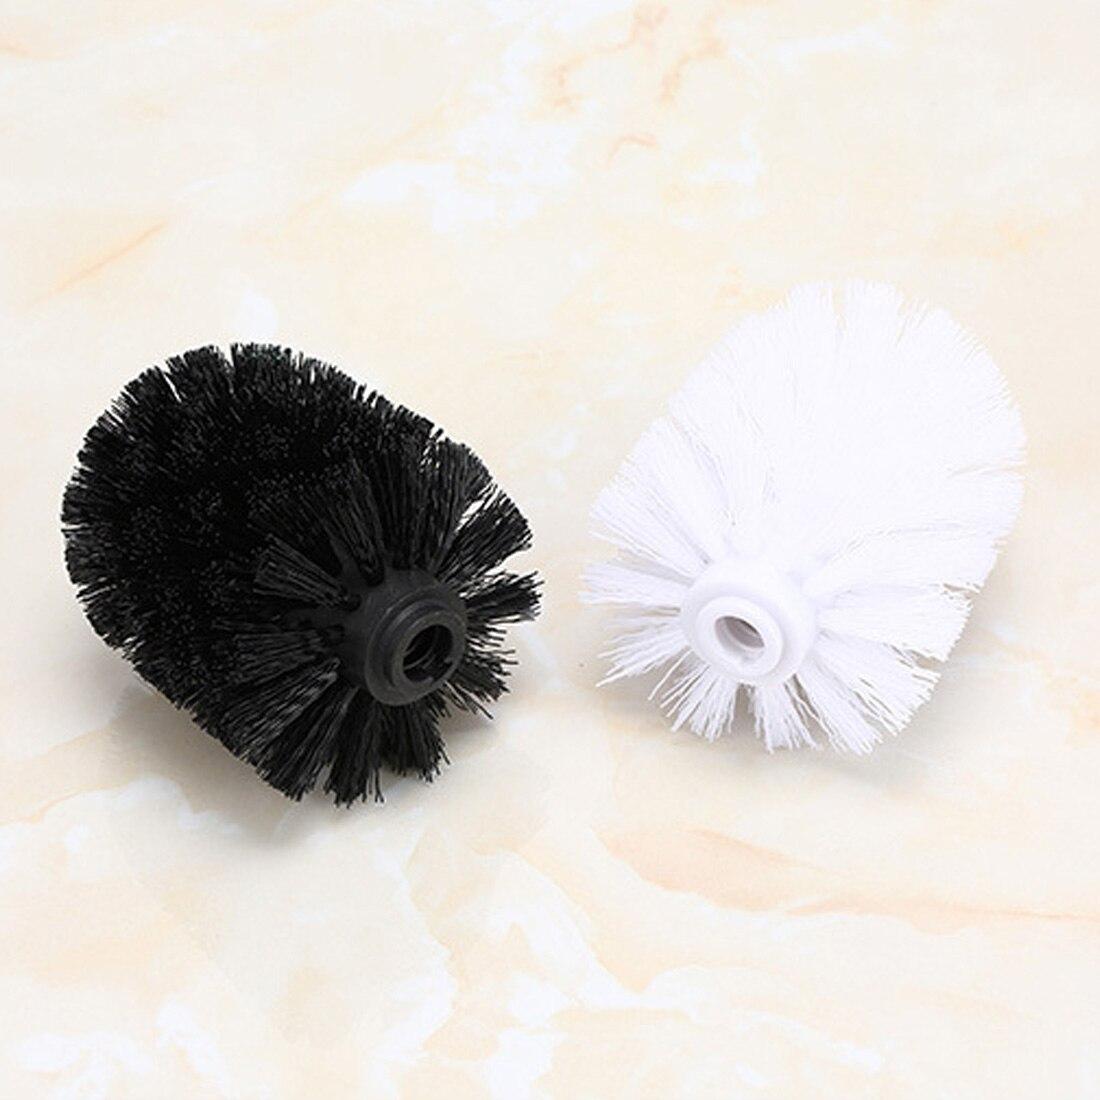 Universal Replacement Toilet Brush Head Holder White Black